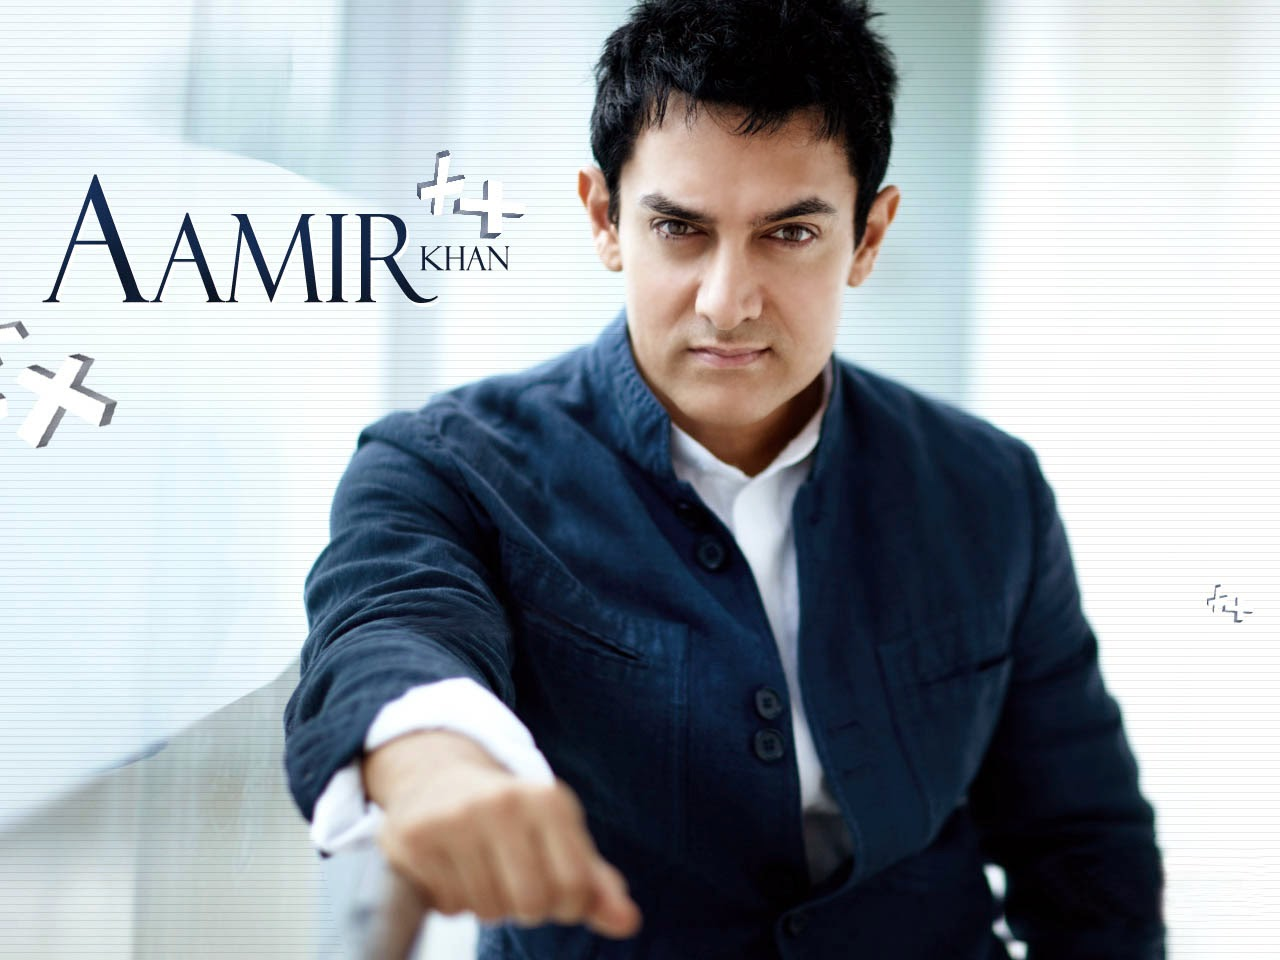 Hd wallpapers aamir khan hd wallpapers 2014 - Aamir khan hd wallpaper ...